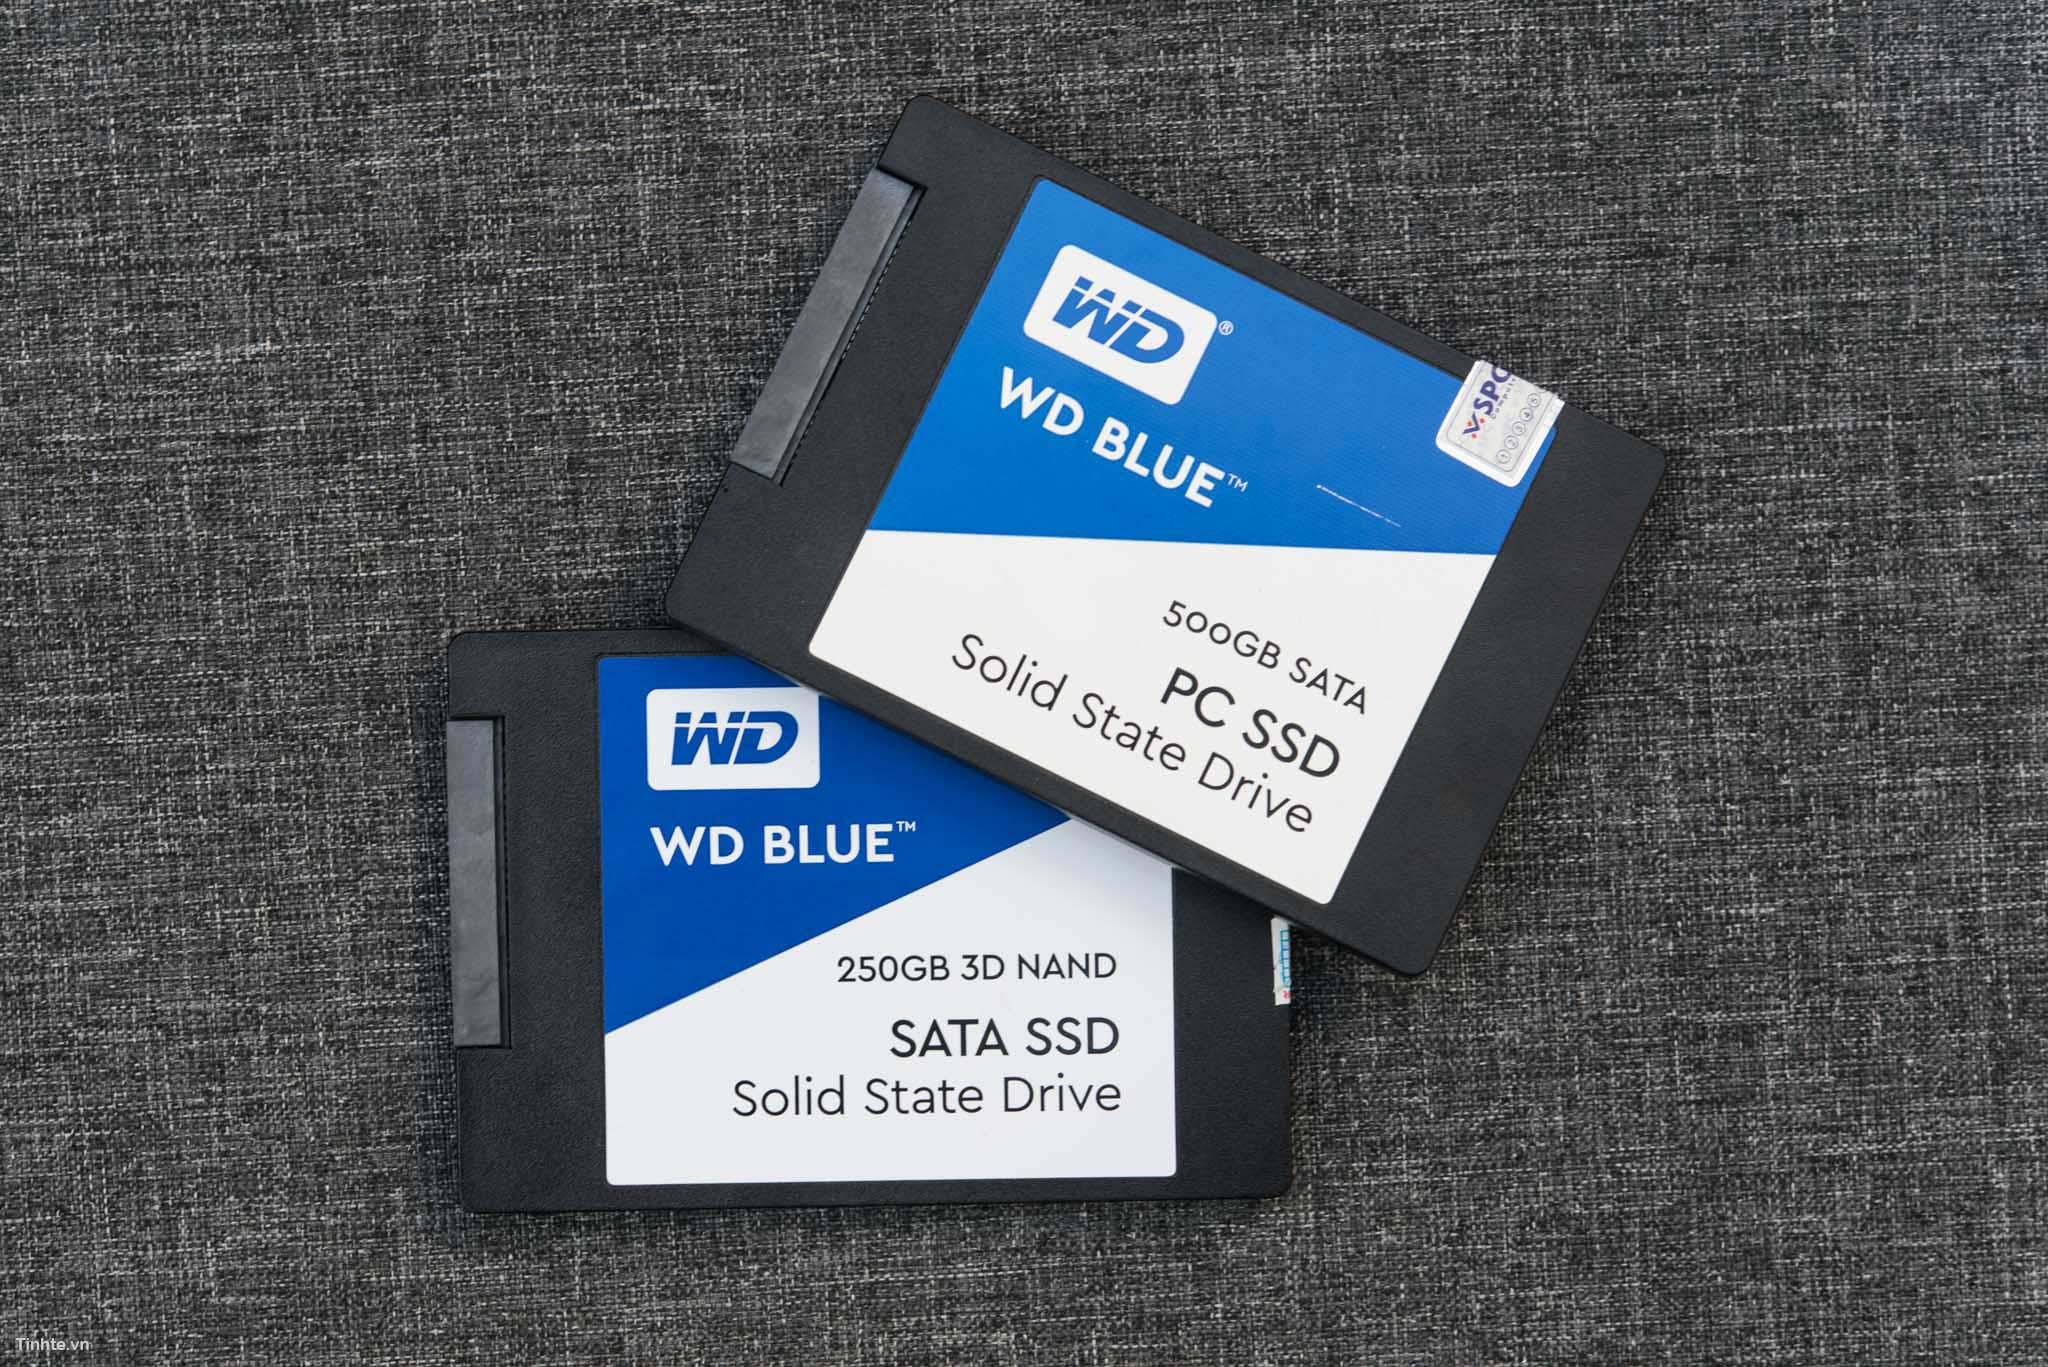 Tinhte.vn_WD_Blue_SSD-1.jpg